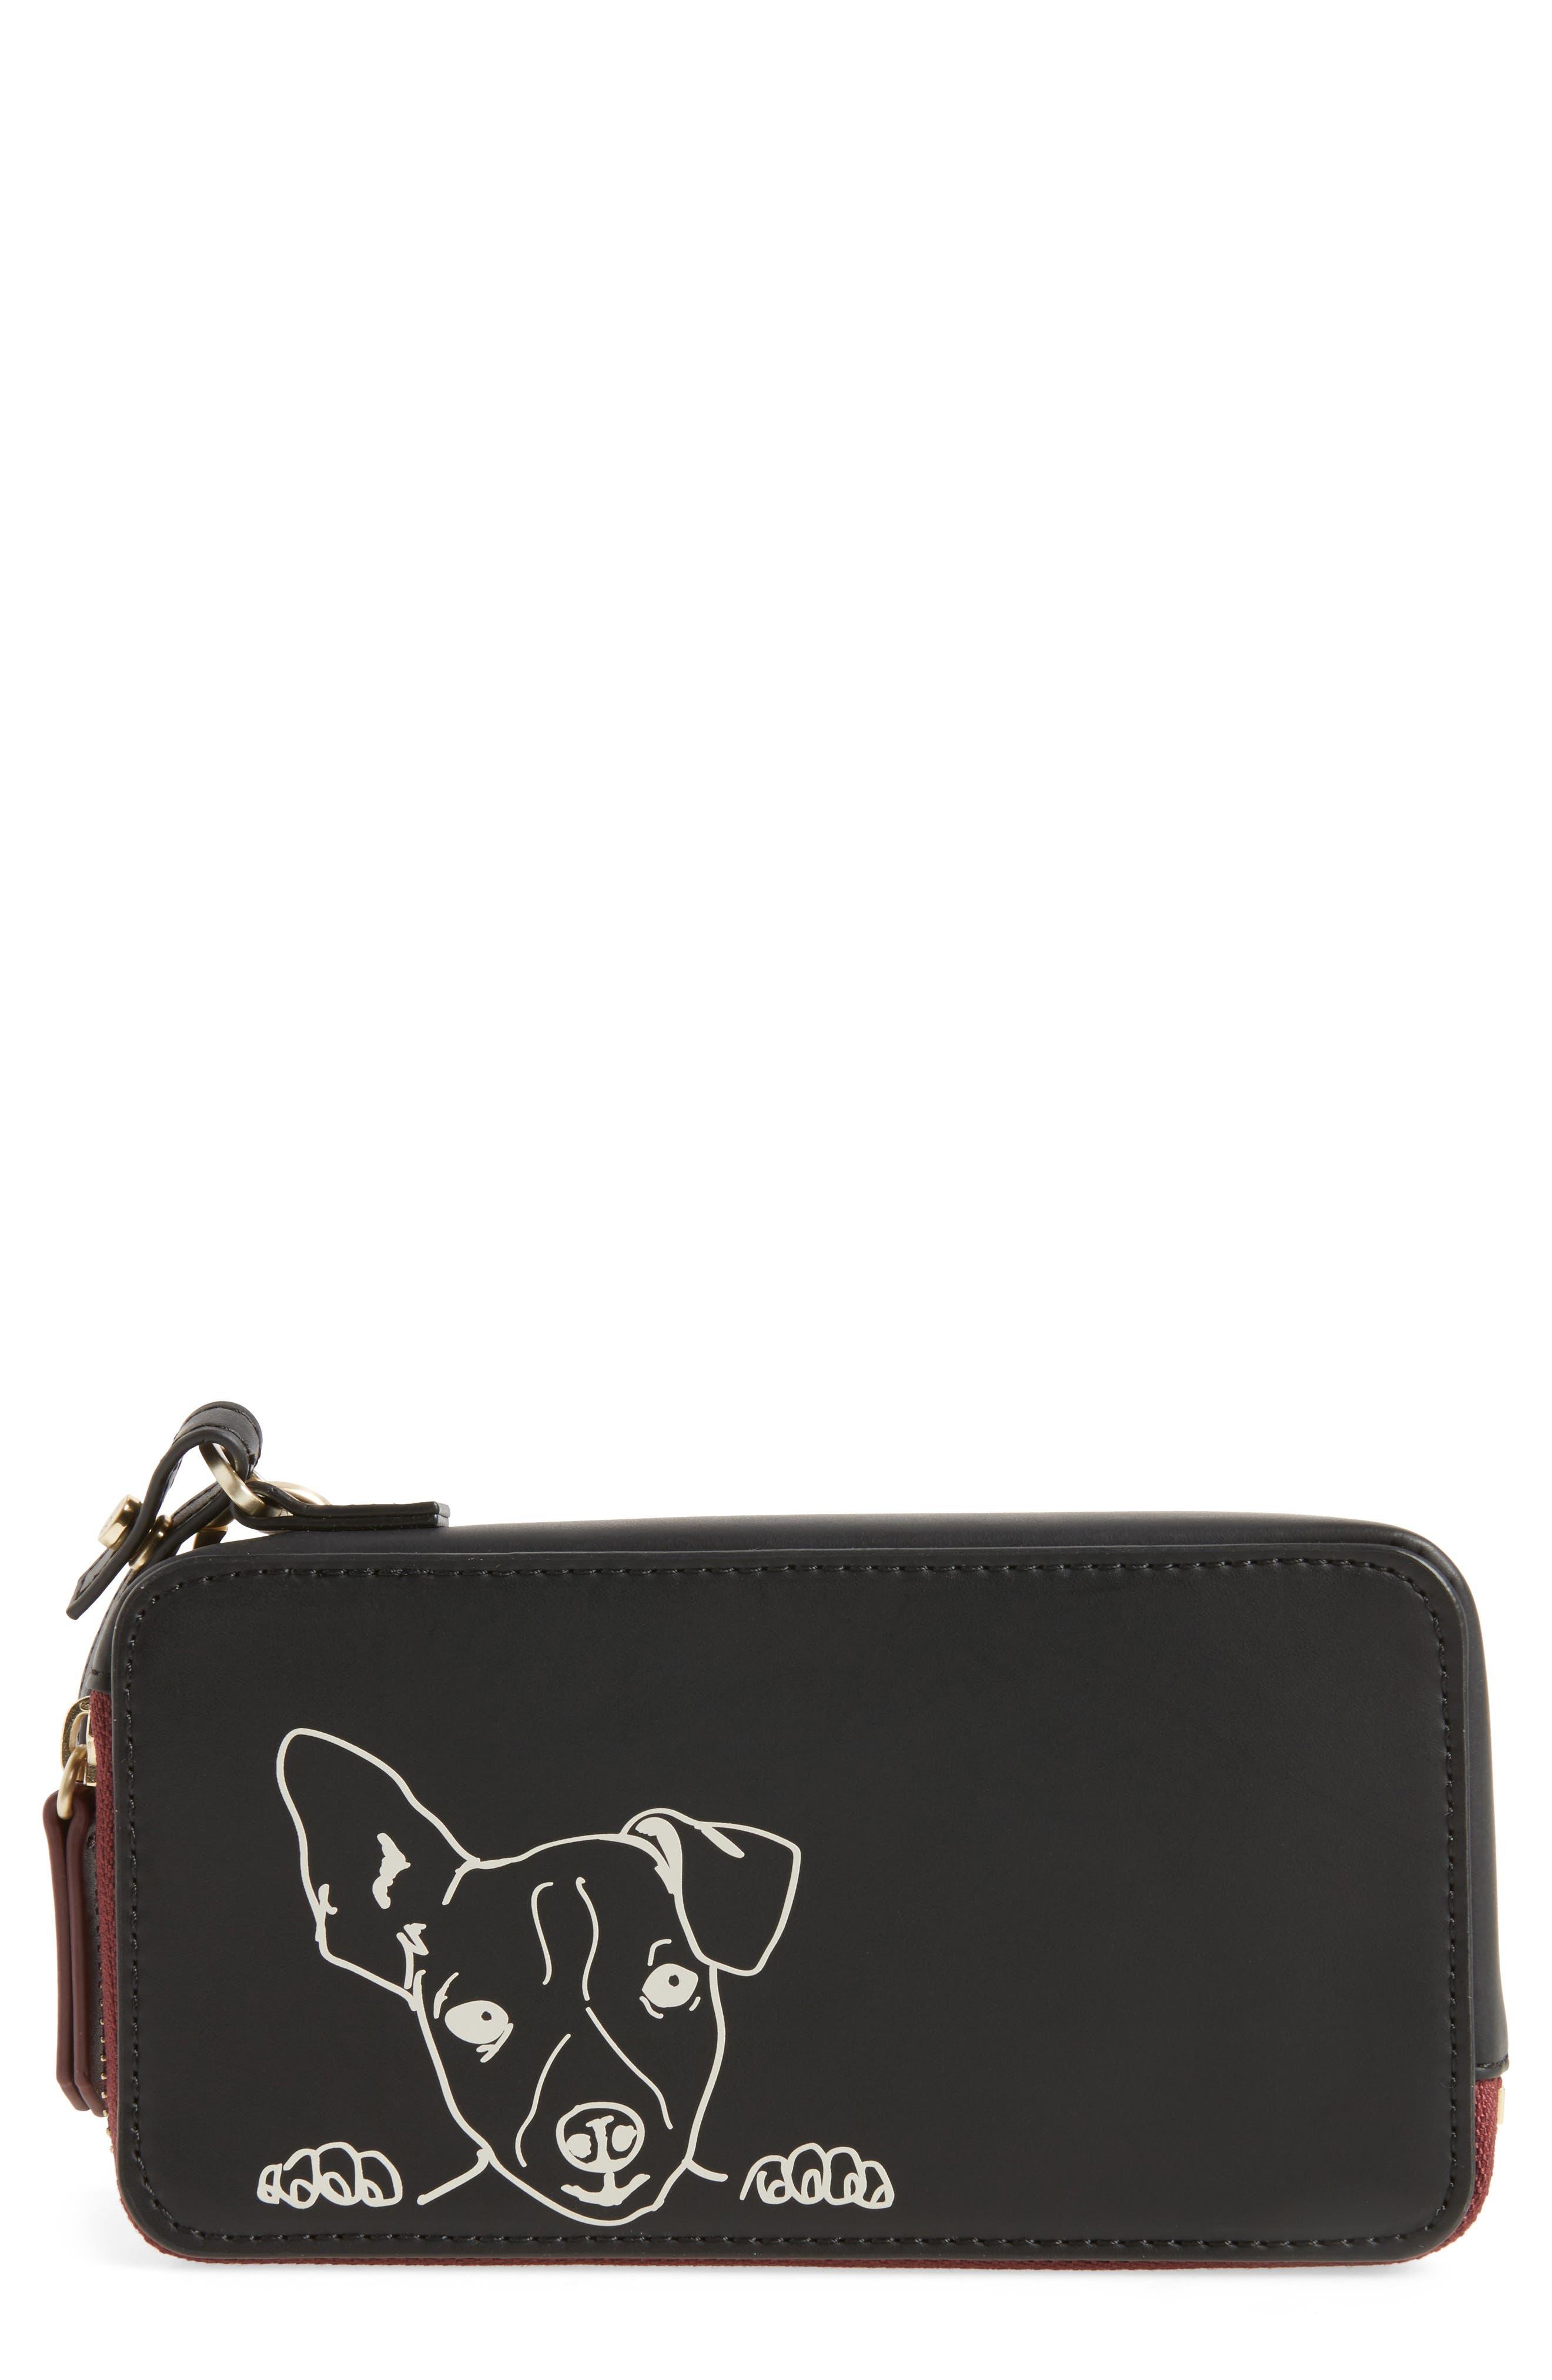 Brea Convertible Smartphone Leather Clutch,                         Main,                         color, 001